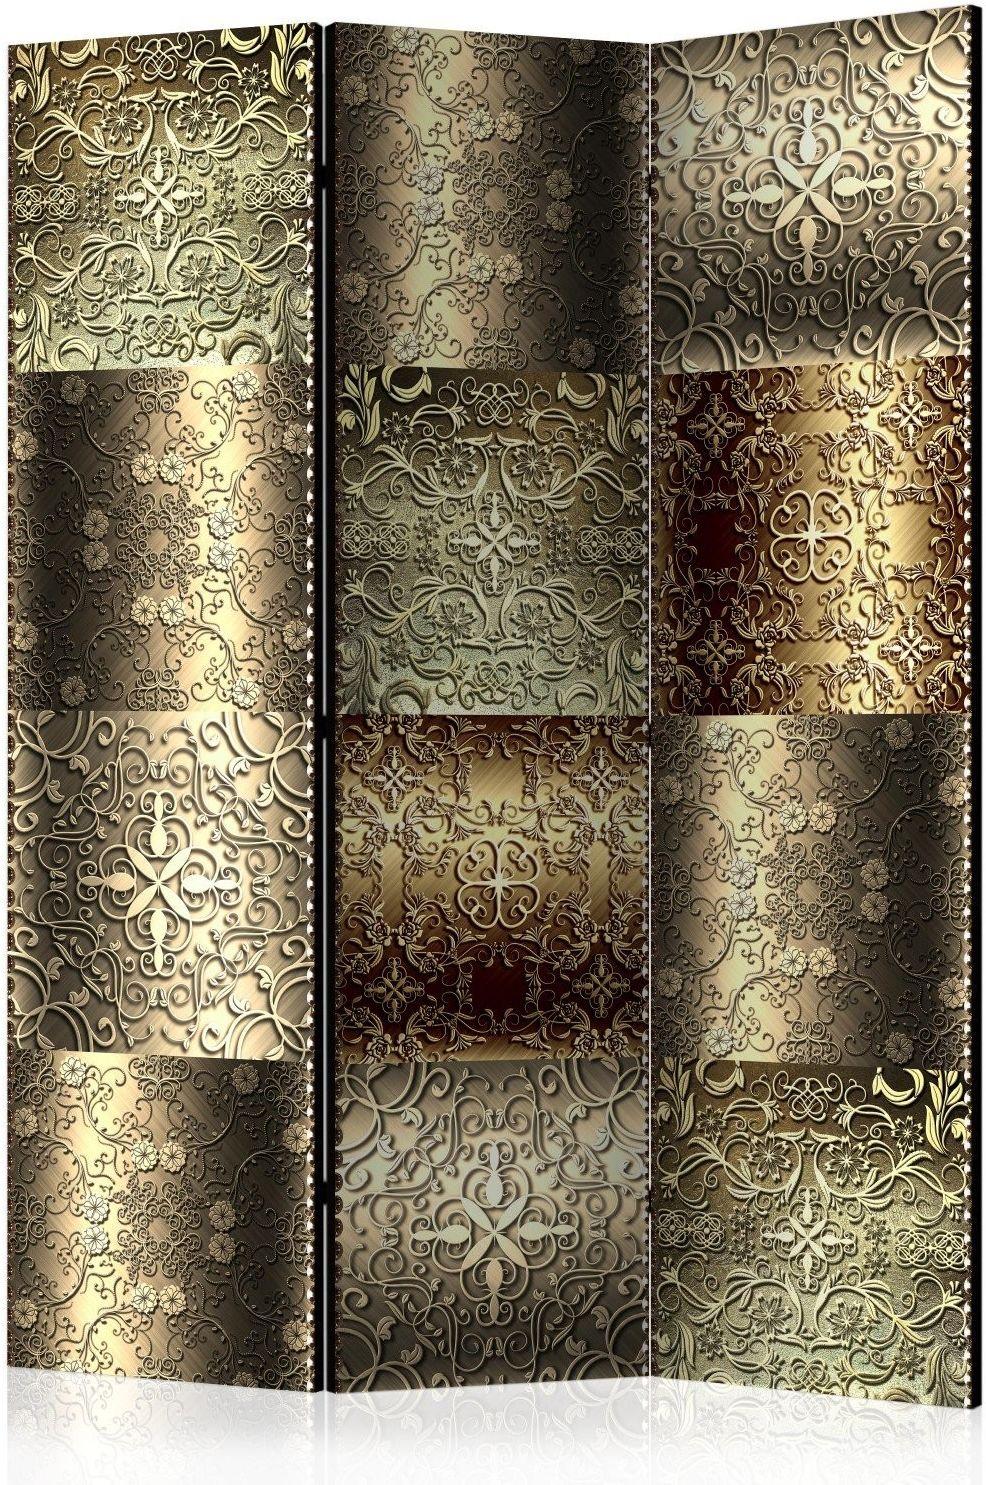 Parawan 3-częściowy - metalowe płytki [room dividers]